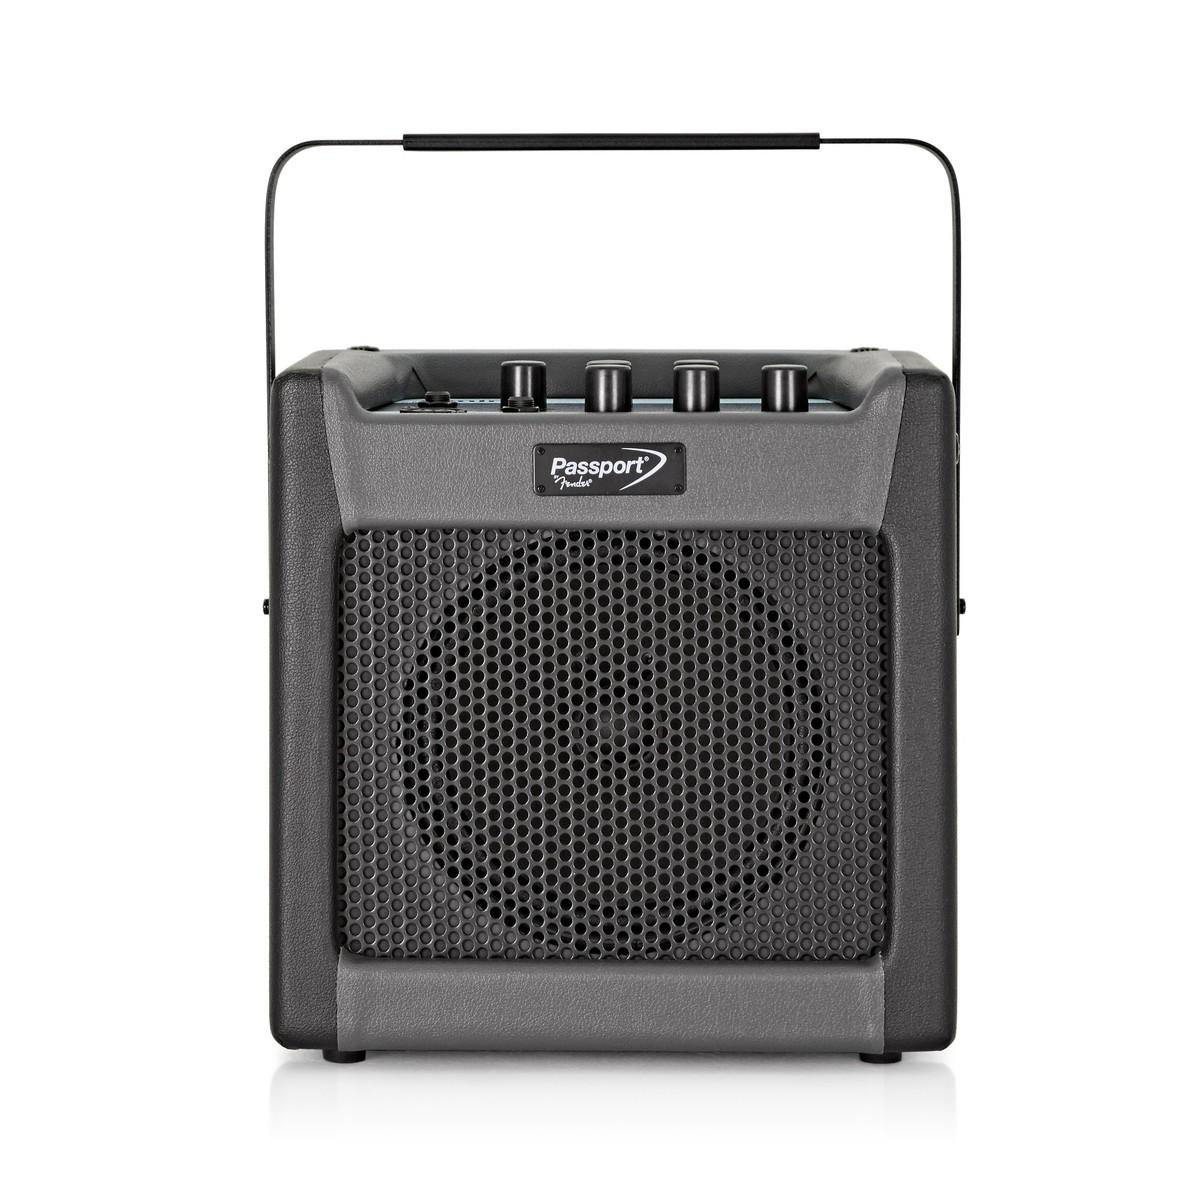 fender passport mini guitar combo amp at gear4music. Black Bedroom Furniture Sets. Home Design Ideas